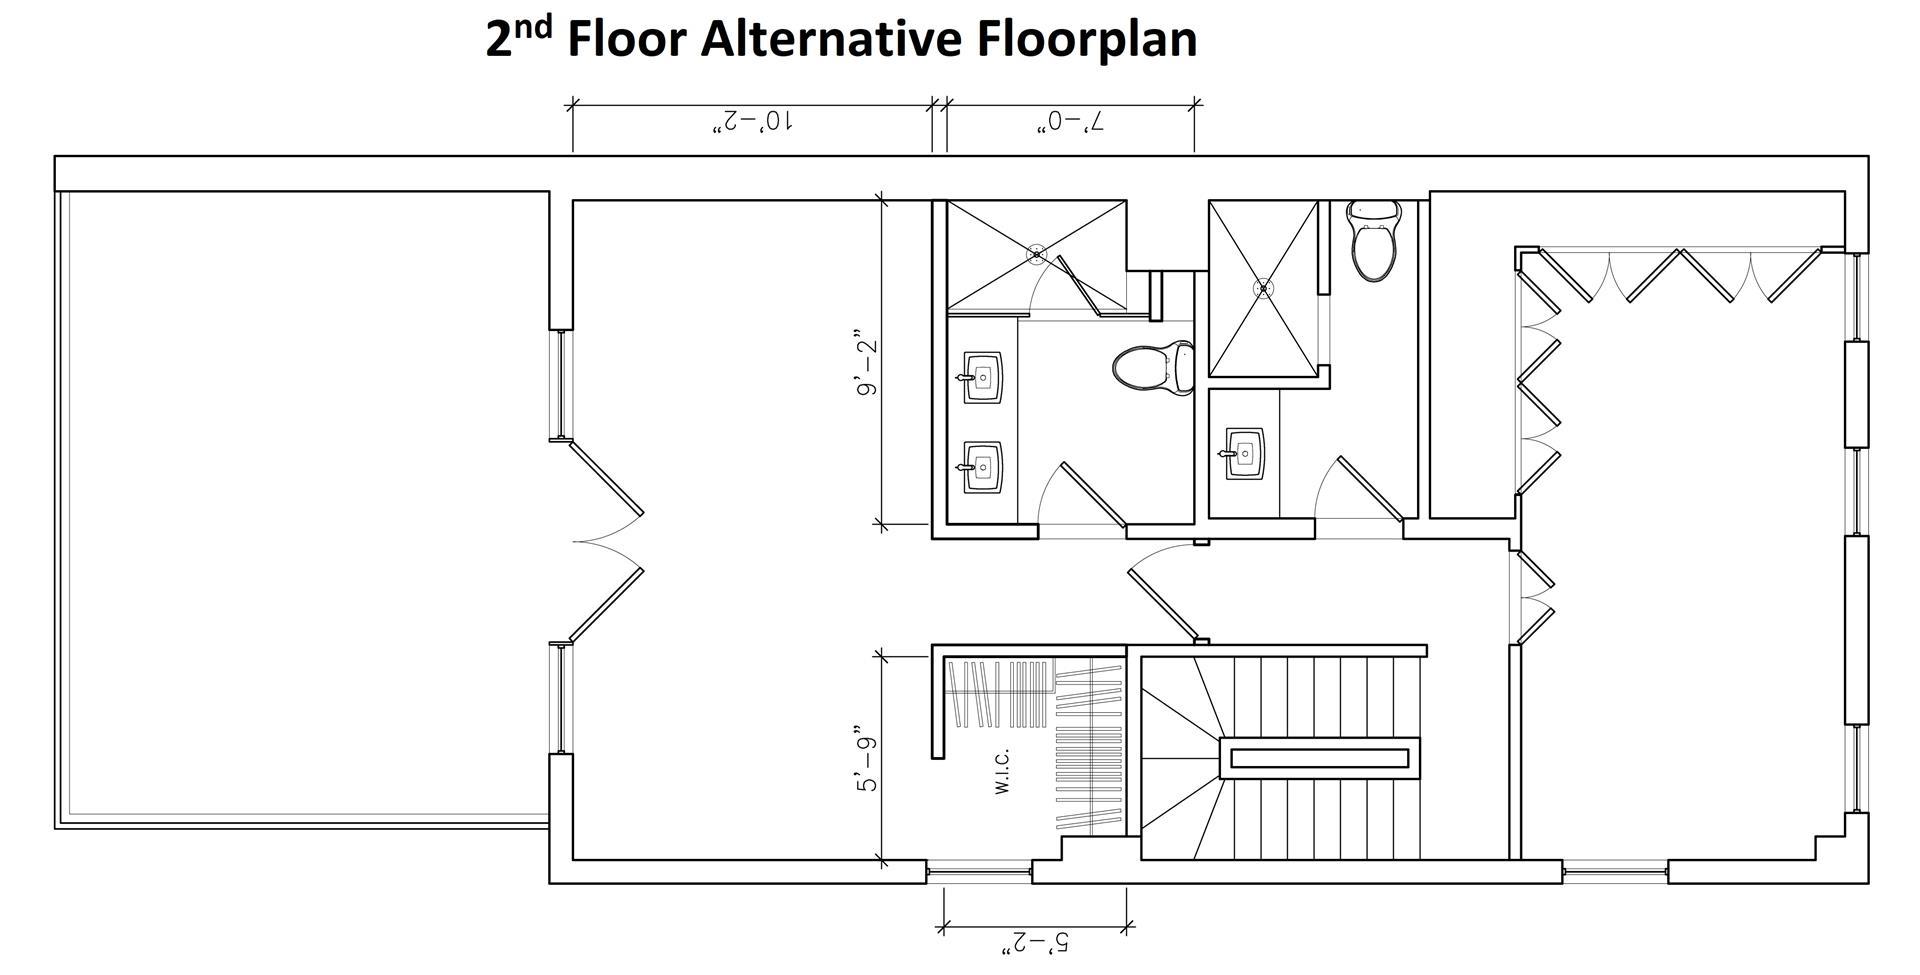 Floor plan of 514 Broome St - SoHo - Nolita, New York